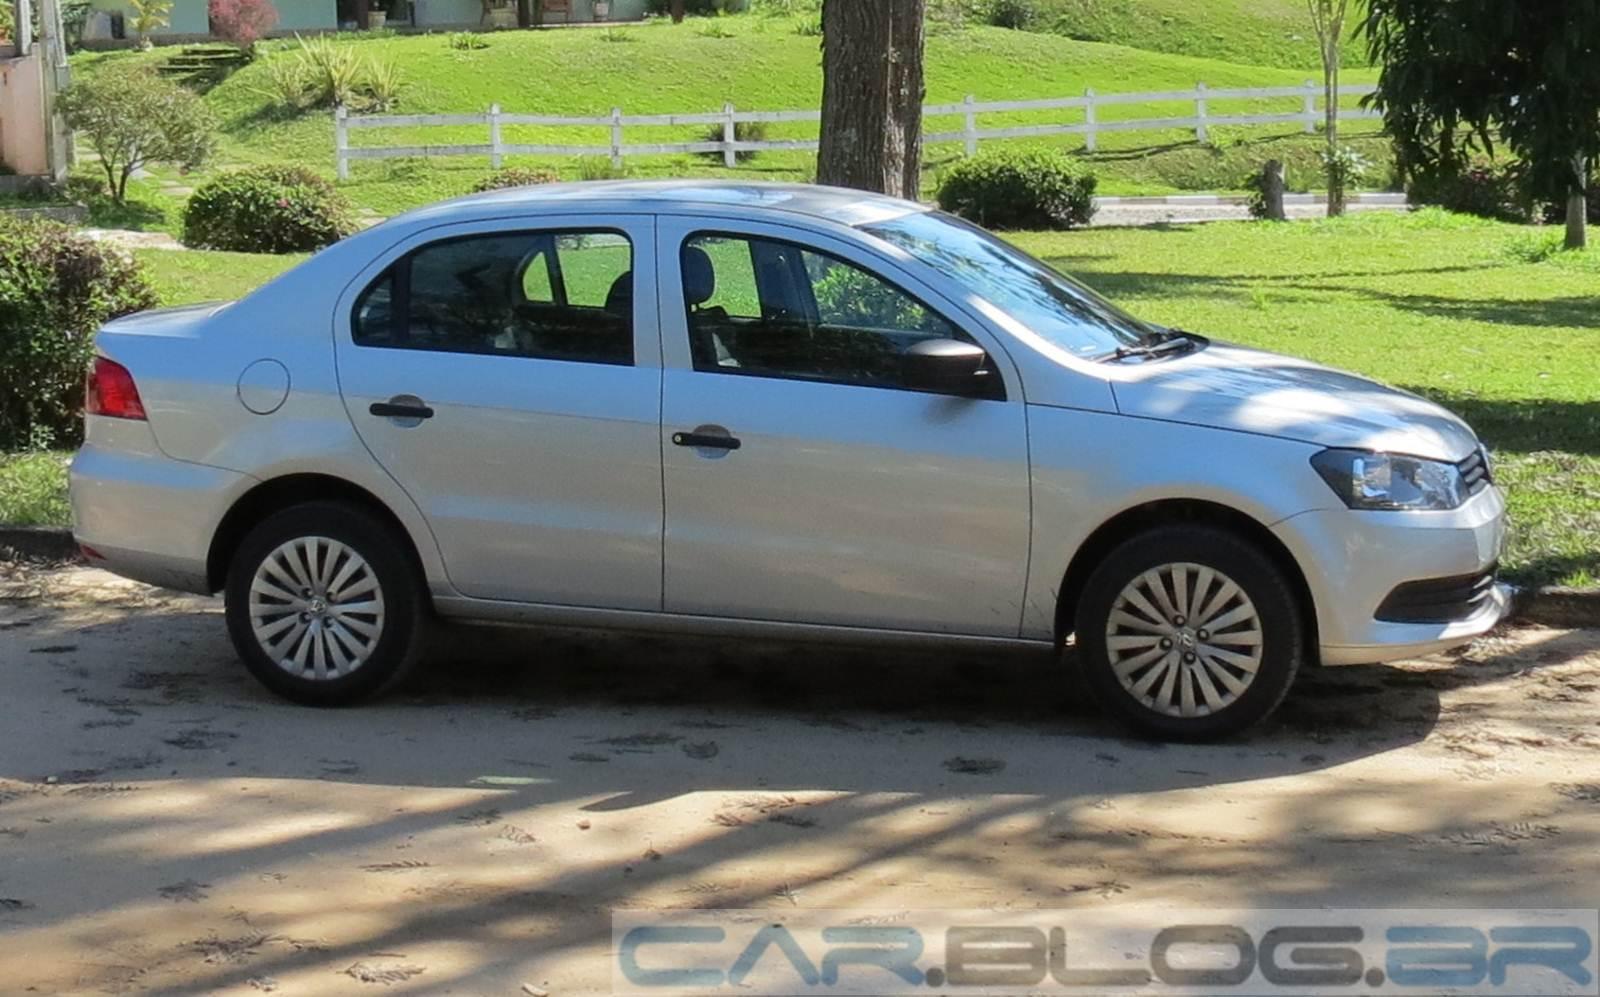 Volkswagen Voyage - produção suspensa